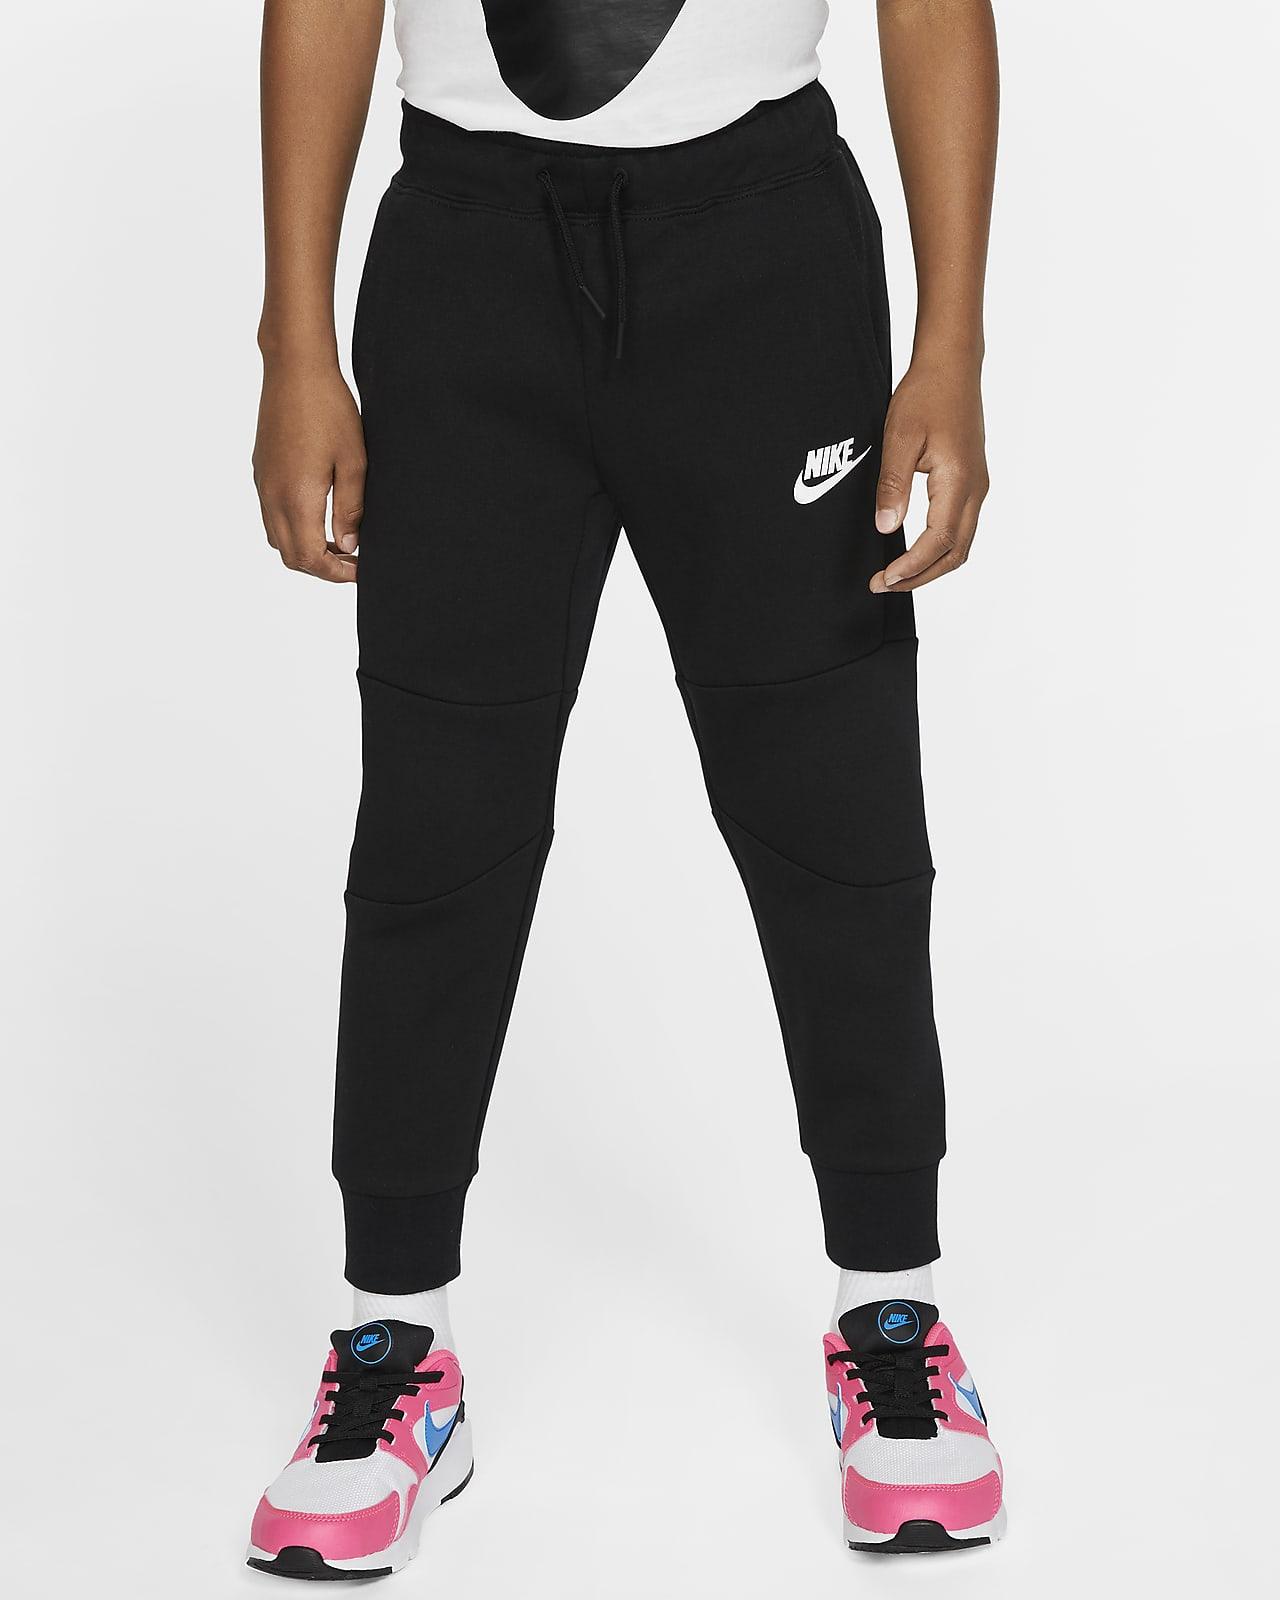 Nike Tech Fleece Younger Kids' Trousers